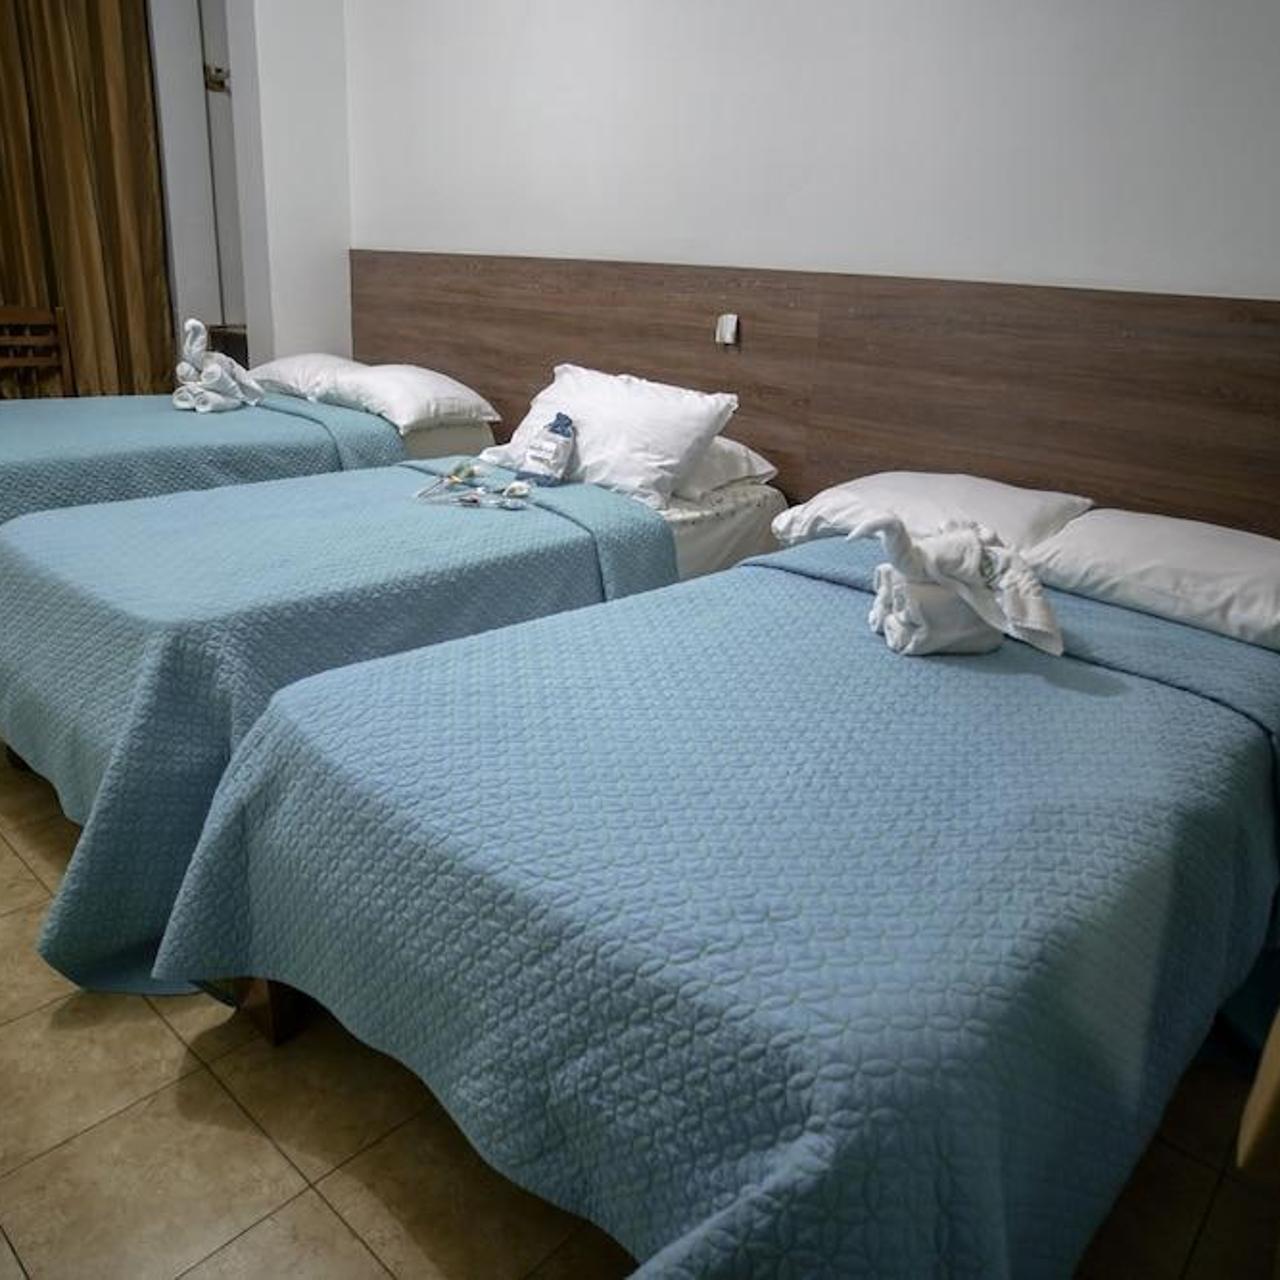 Grand Hotel Chatham Ecuador En Hrs Con Servicios Gratuitos